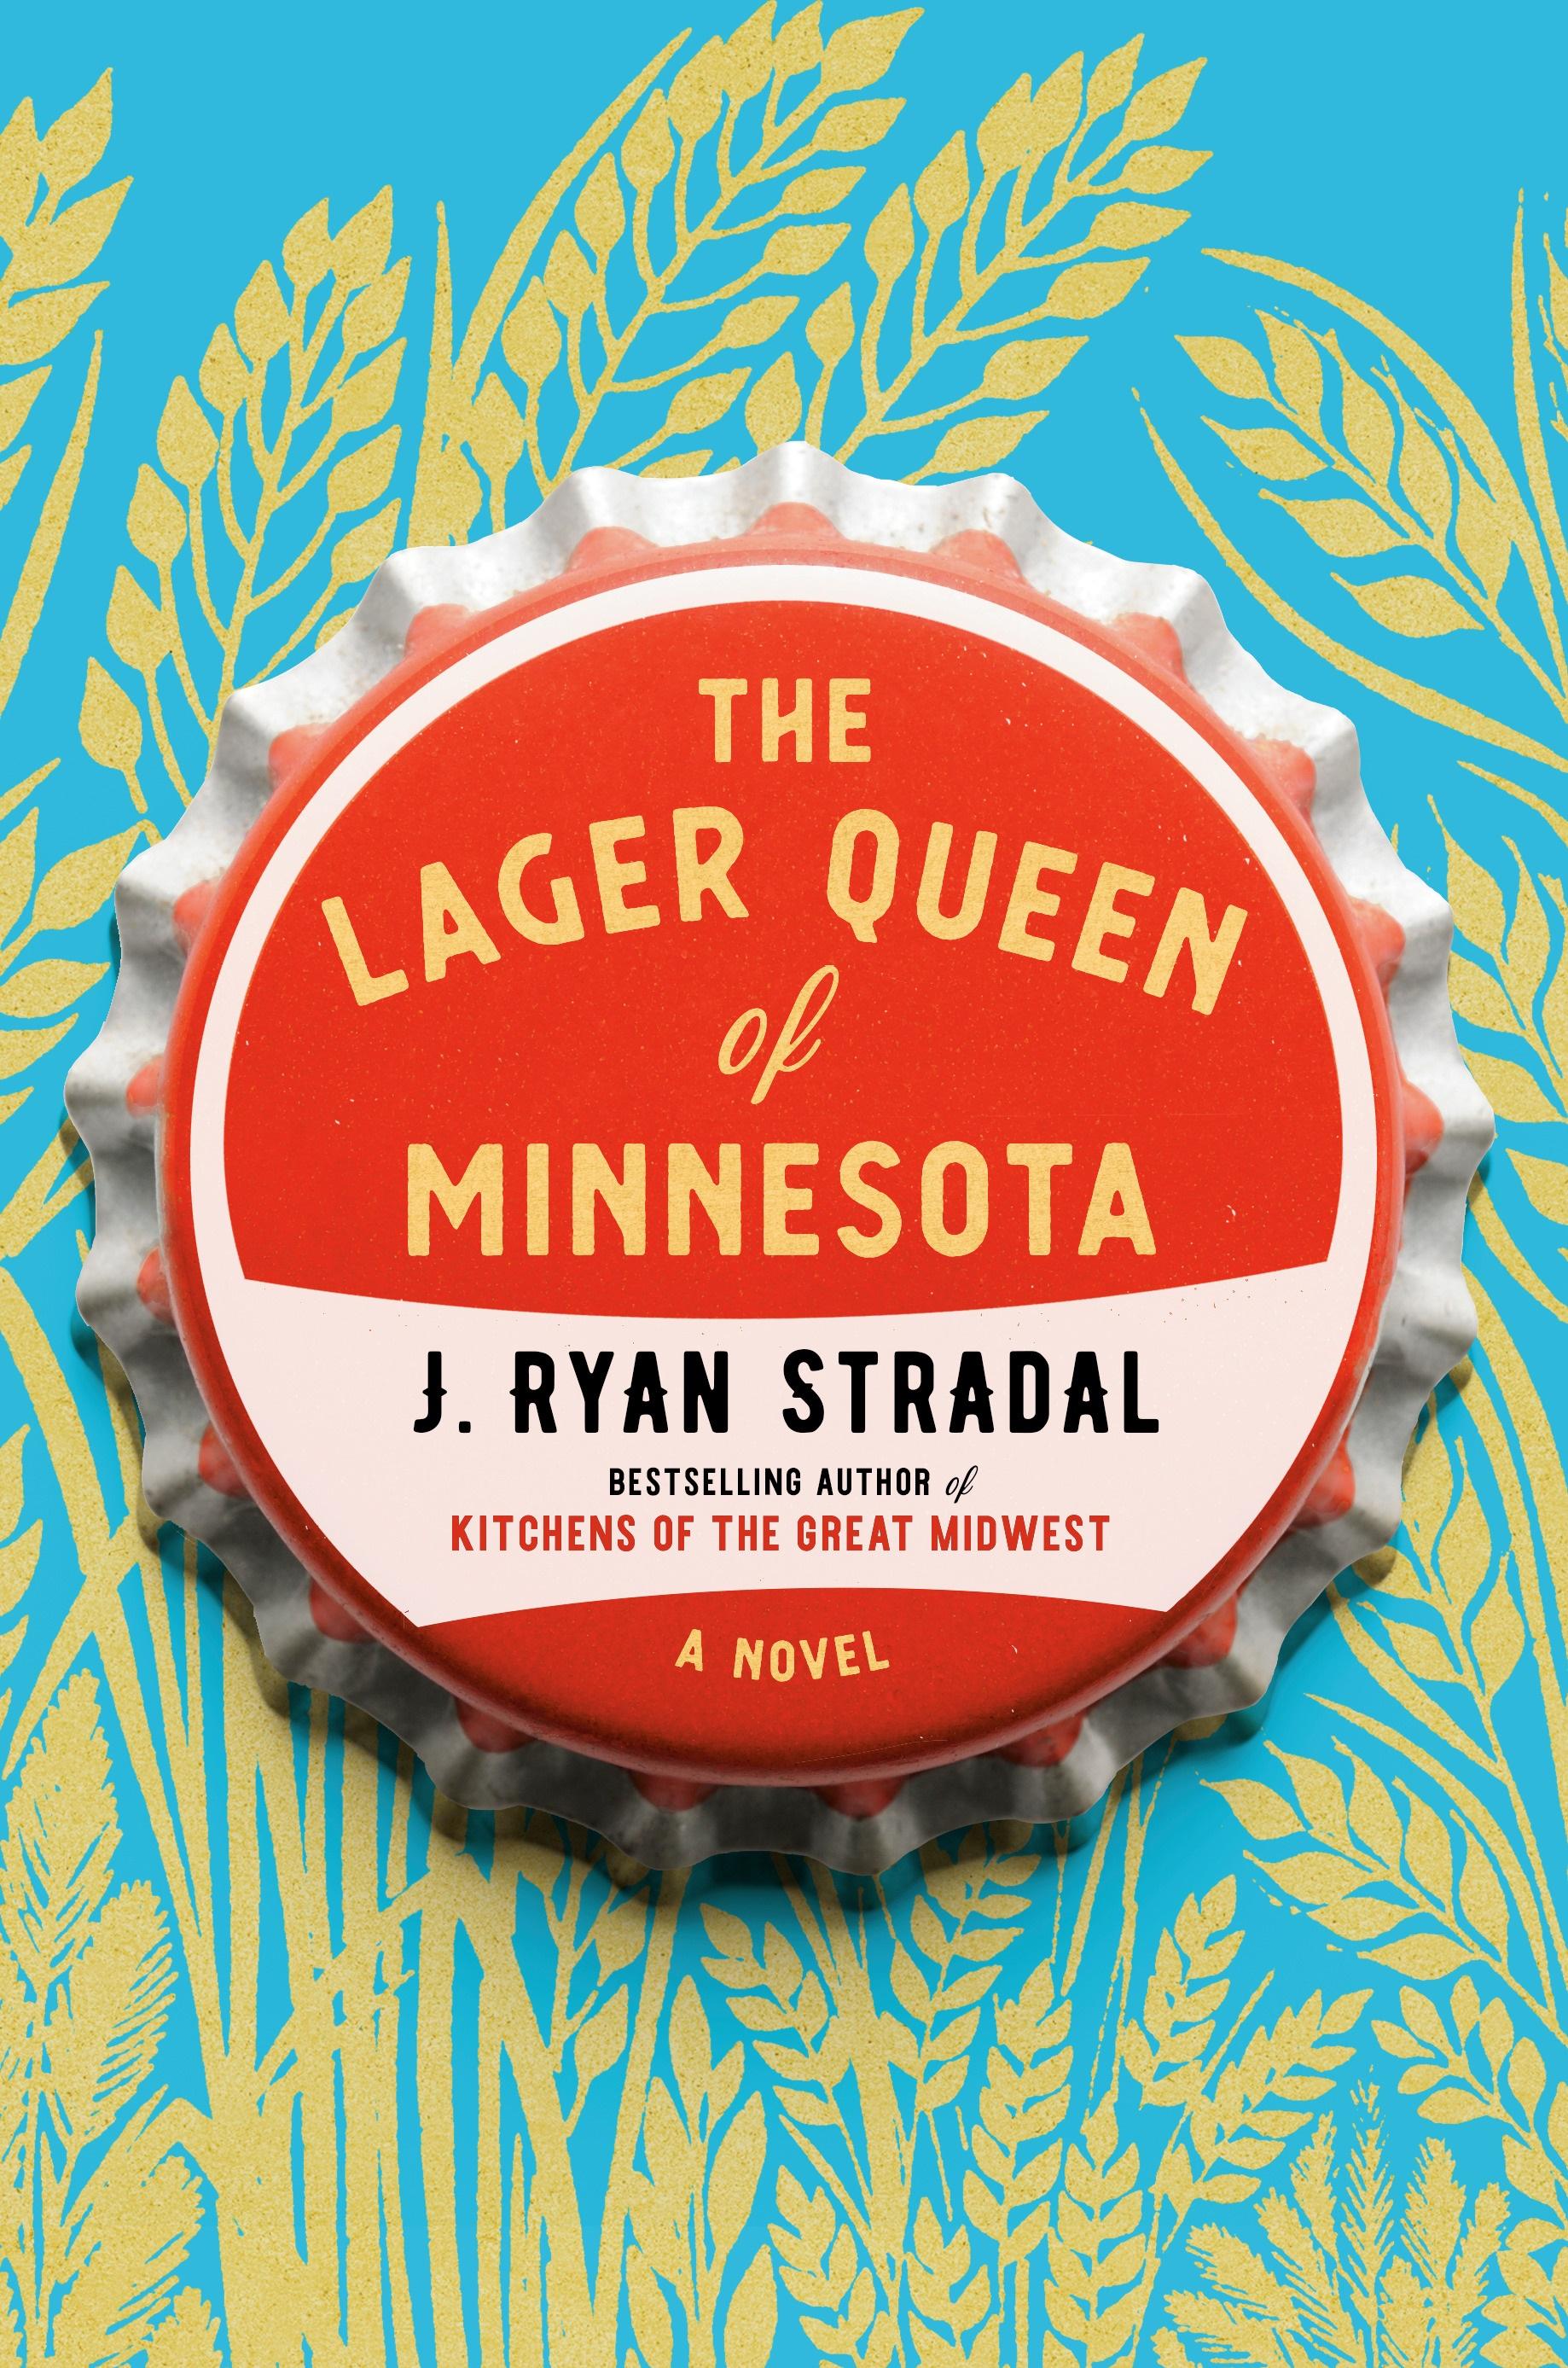 9780399563058.d_The_Lager_Queen_of_Minnesota.jpg